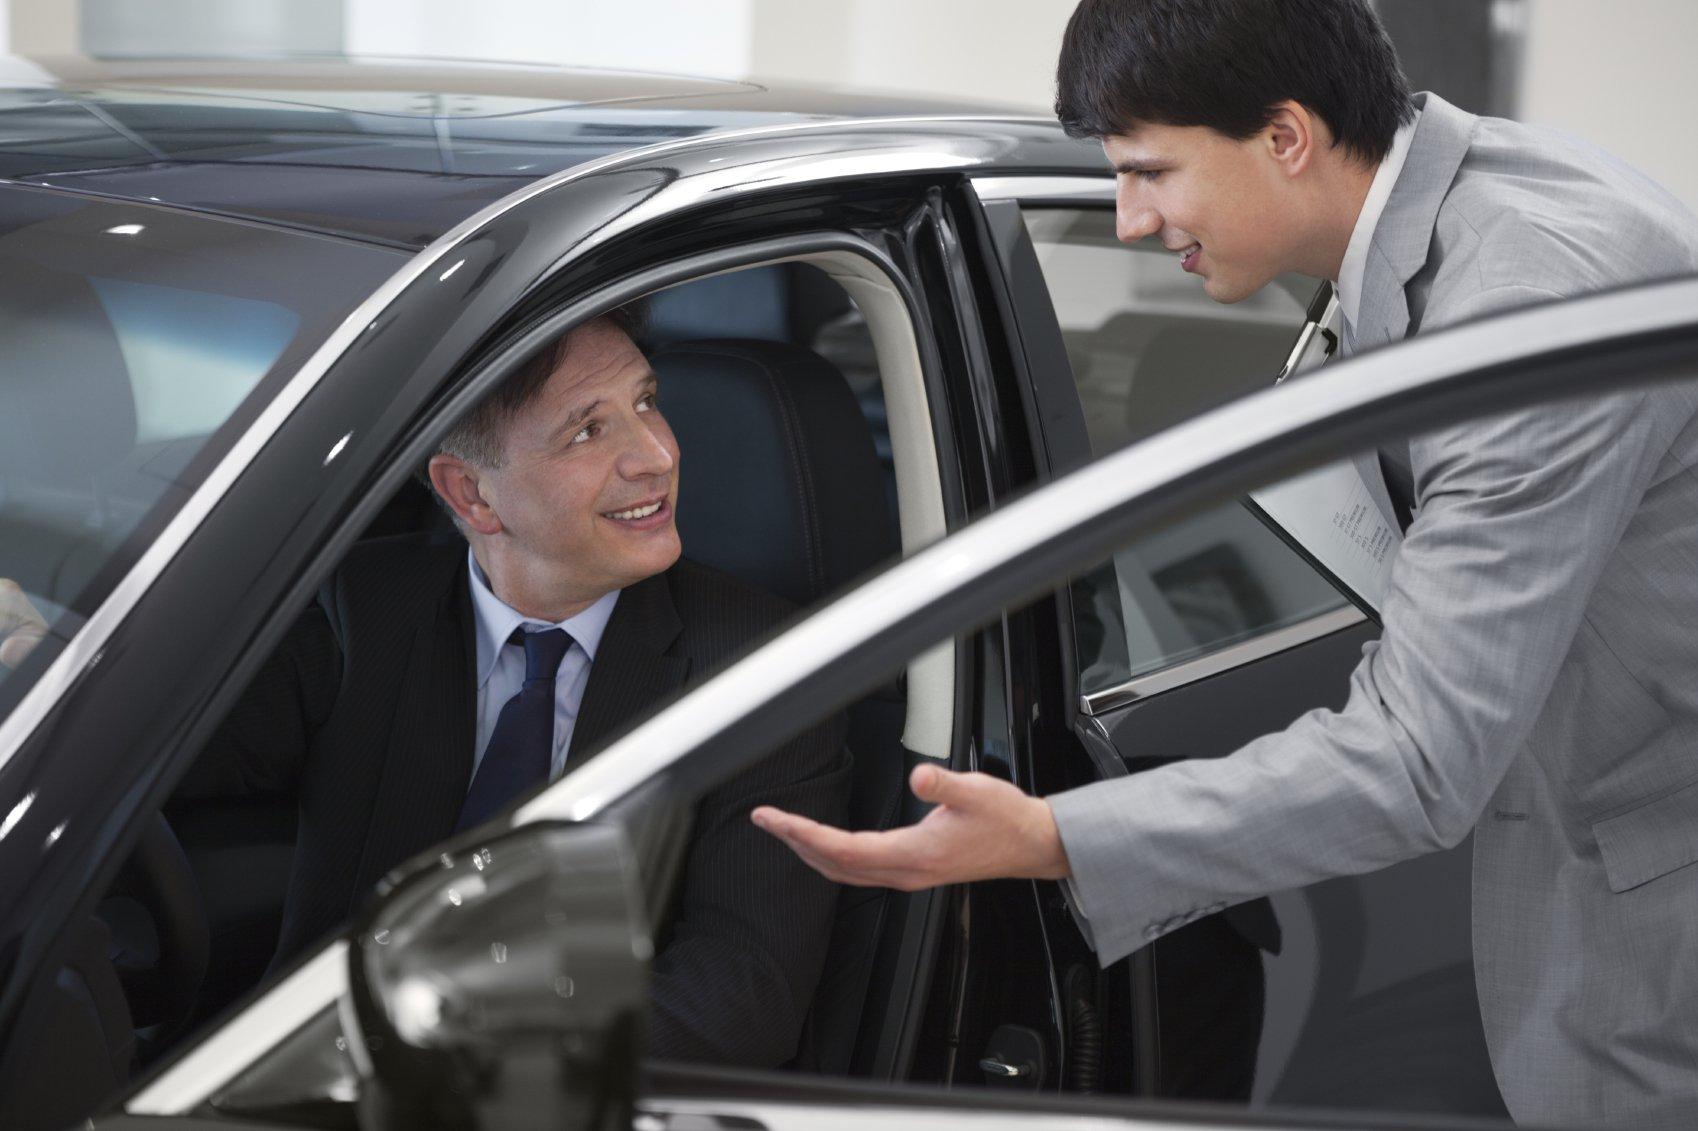 Chauffeur Services Worldwide